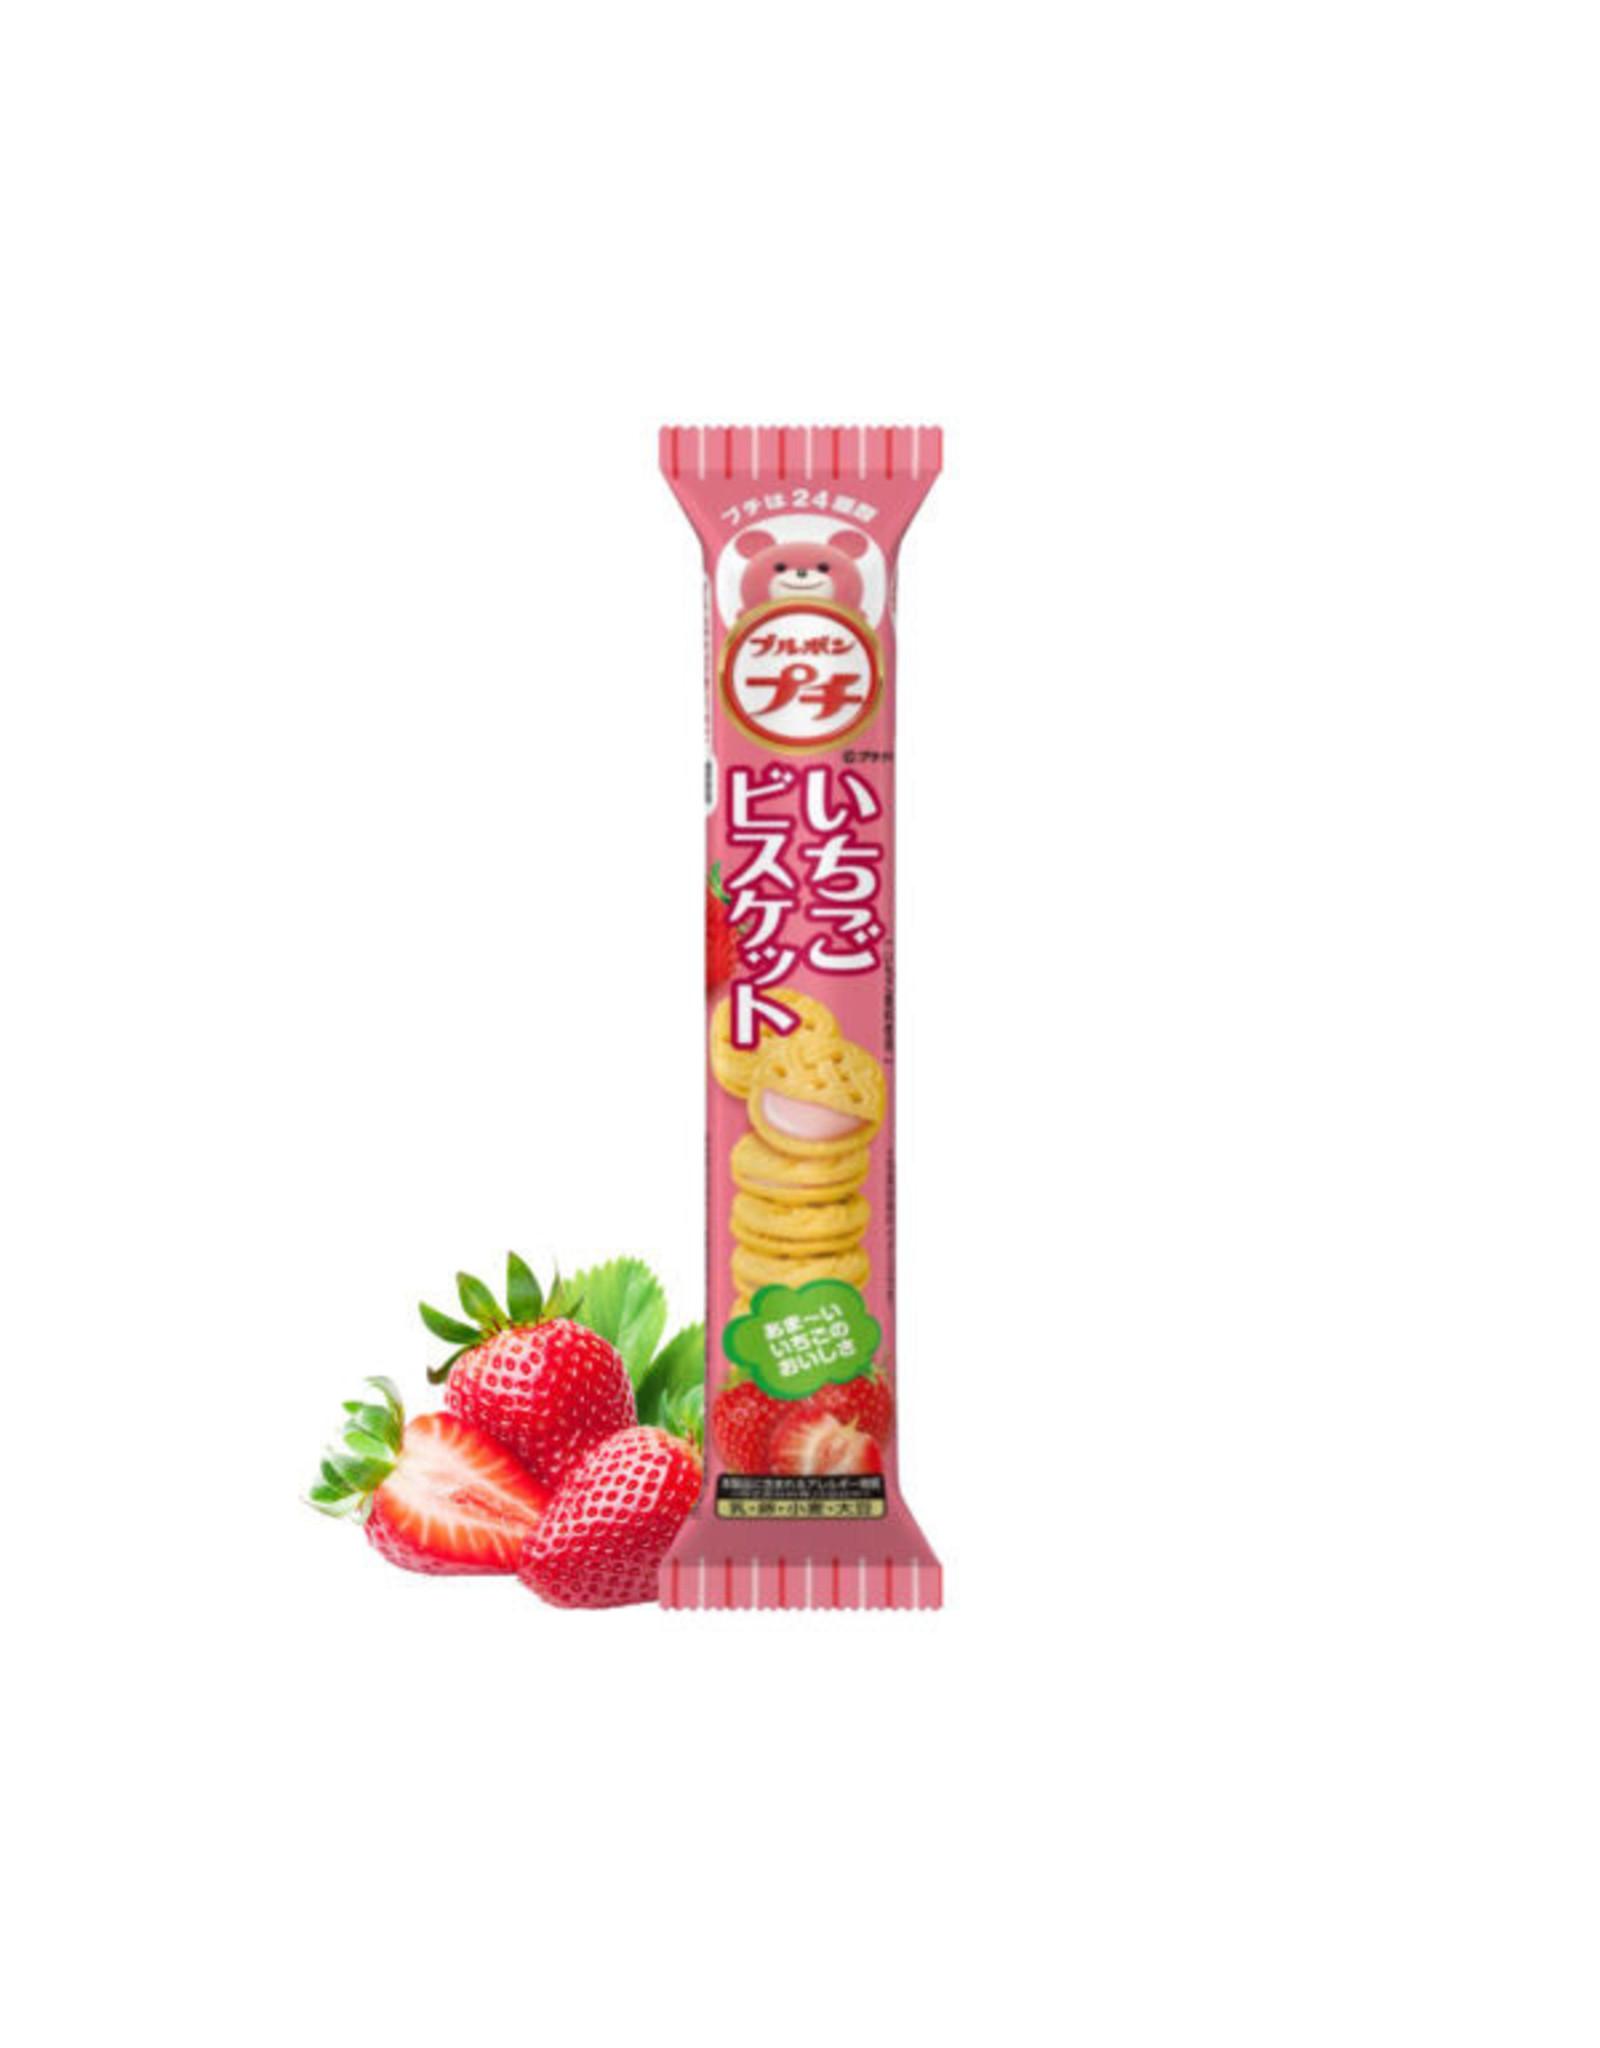 Petit Ichigo Strawberry Biscuits